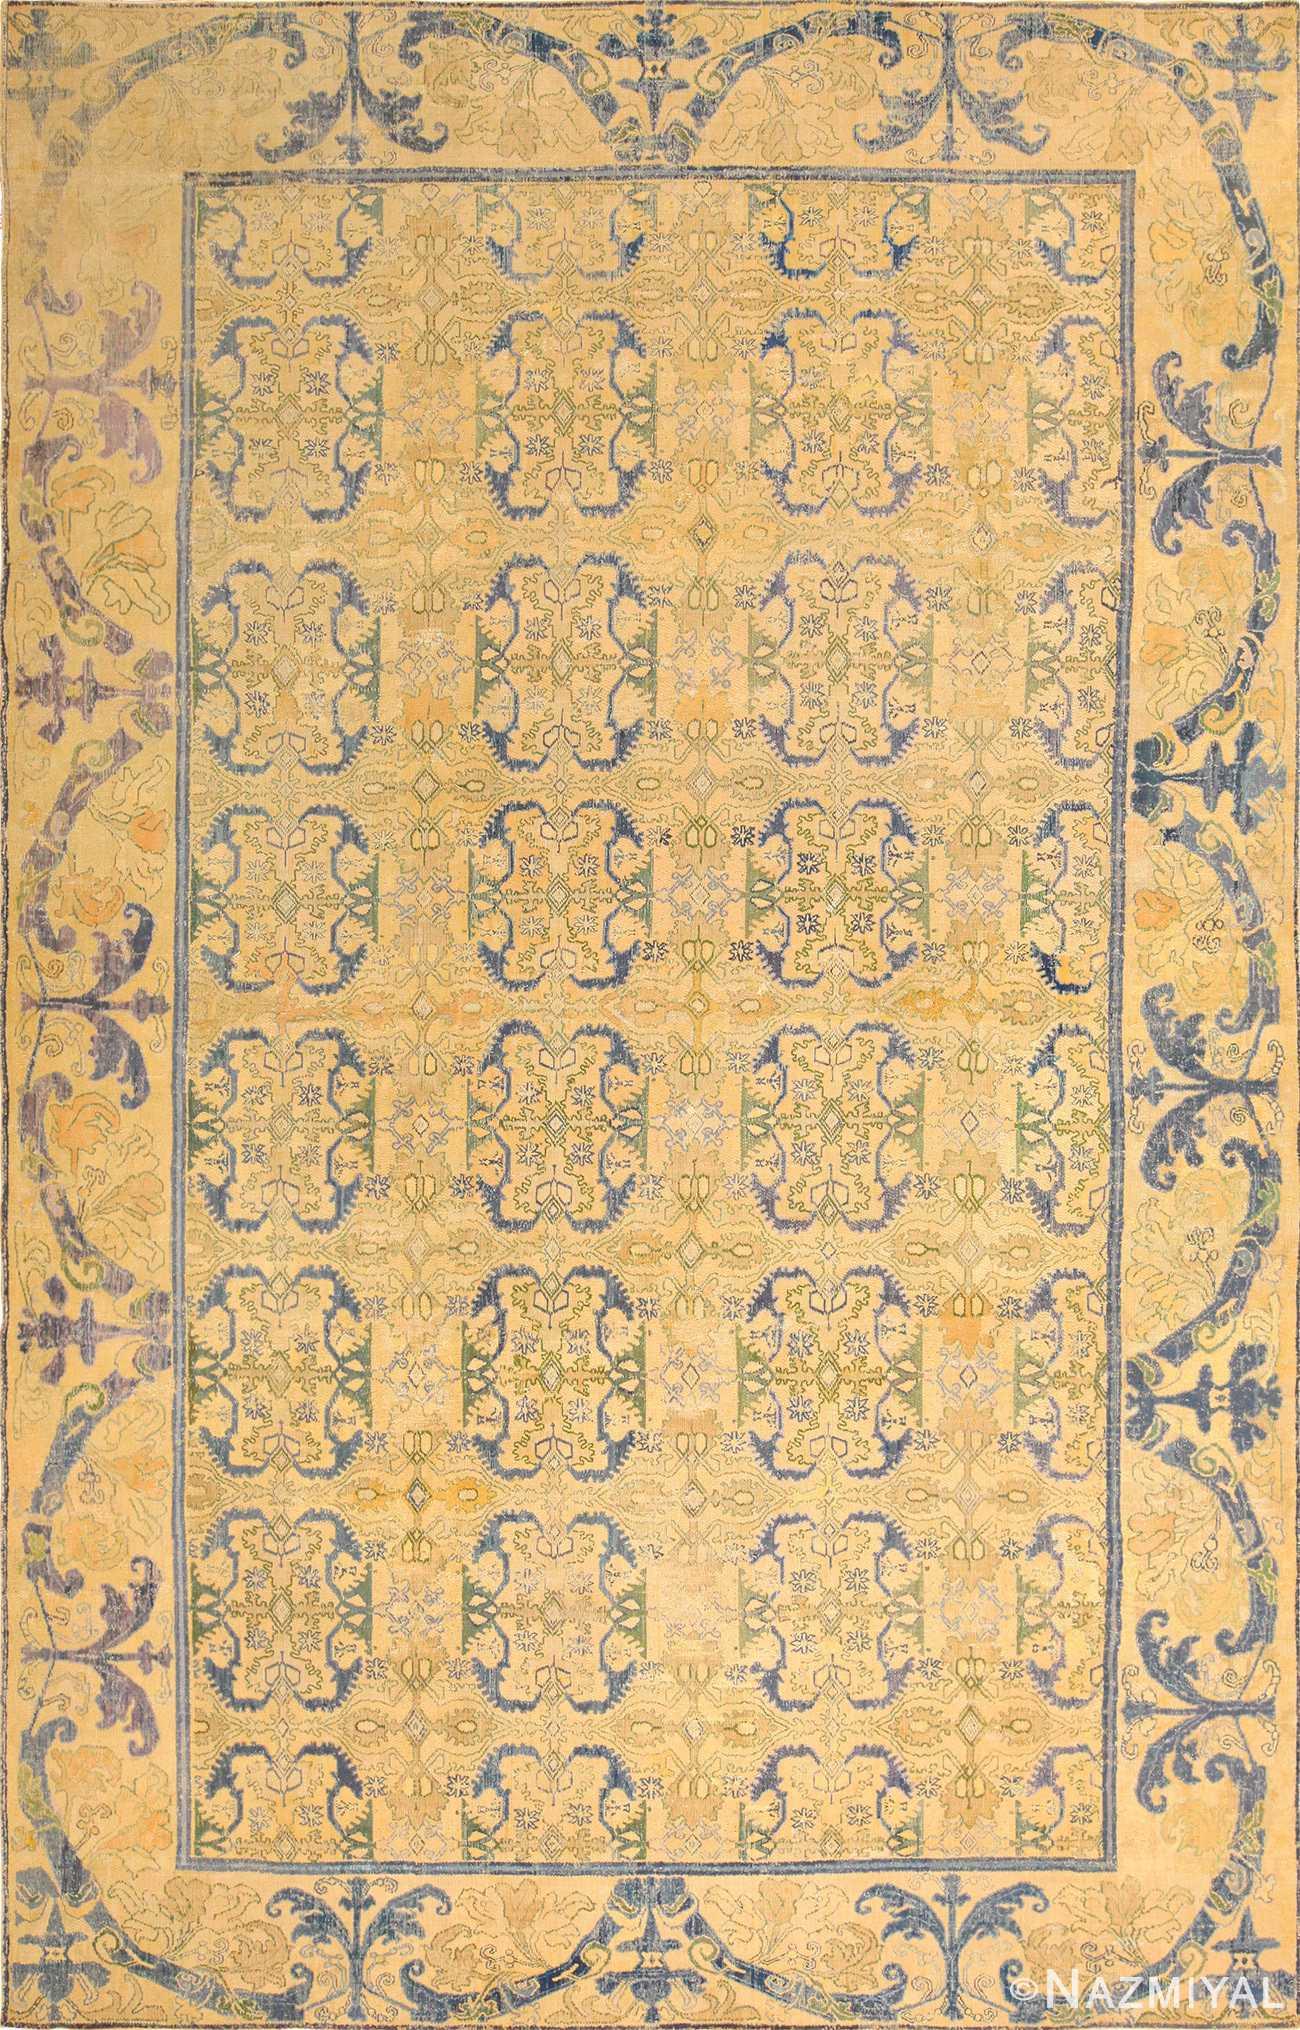 17th century cuenca spanish rug 49270 Nazmiyal